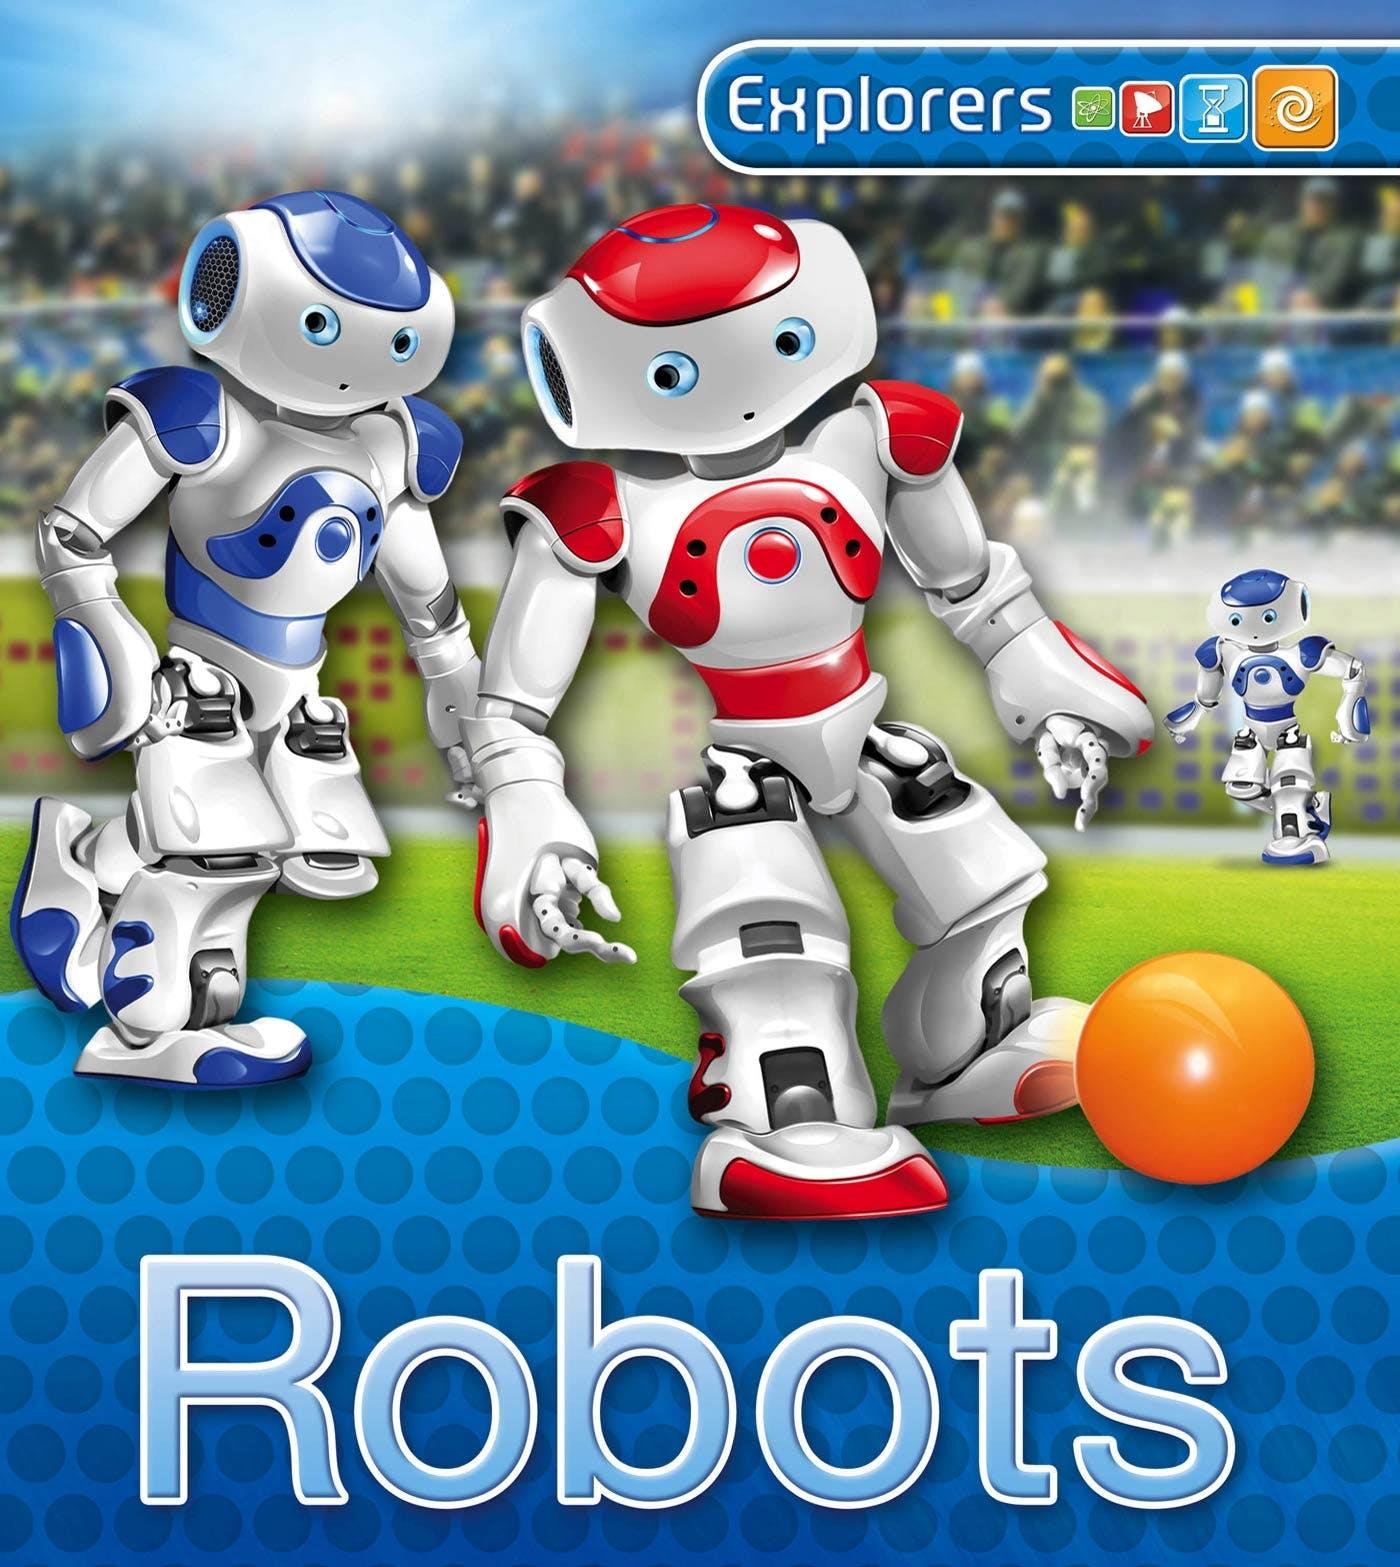 Image of Explorers: Robots